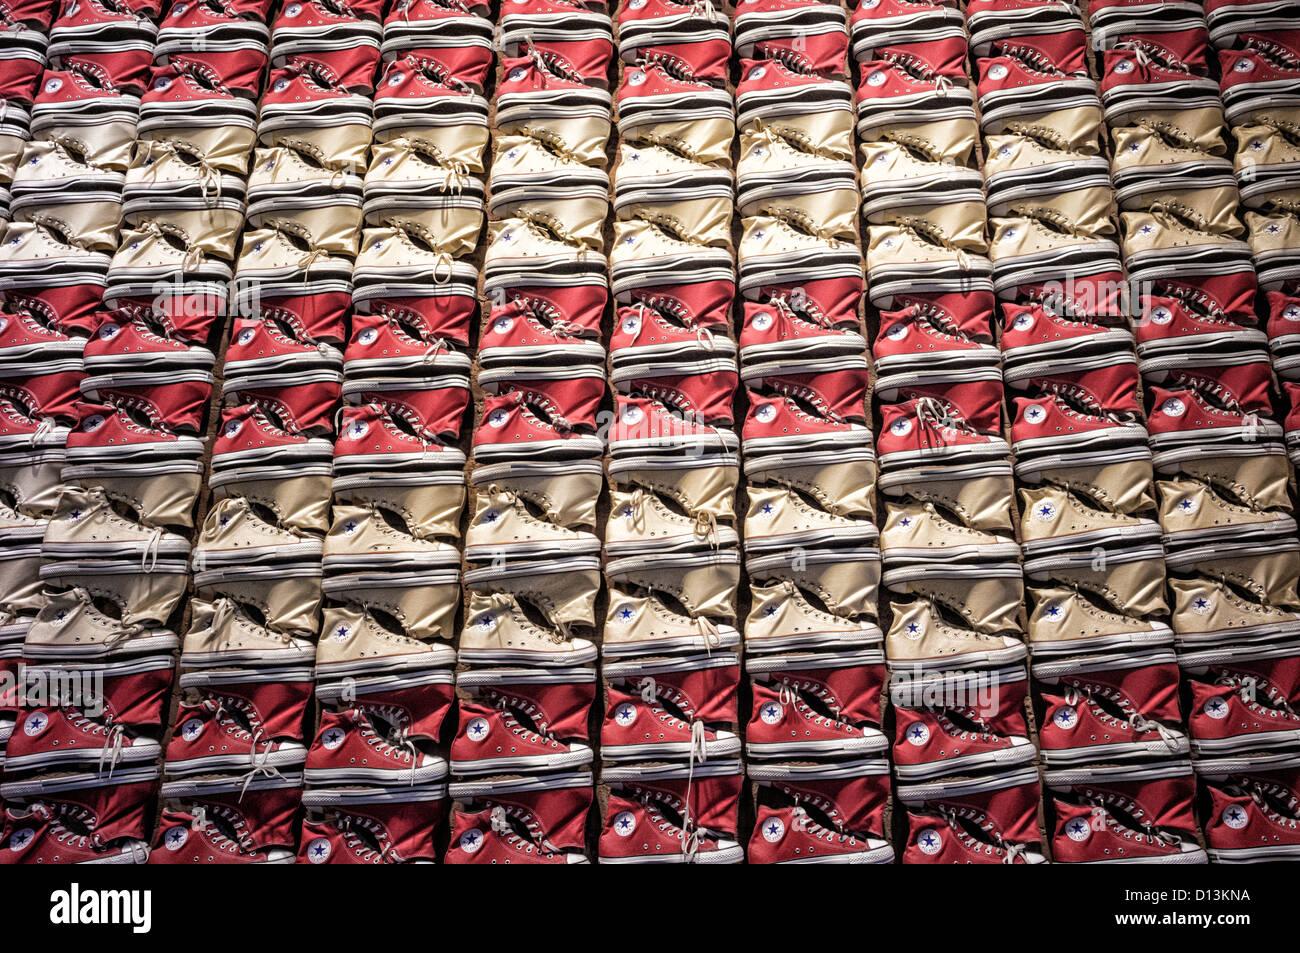 Converse Shoe Store Stockfotos & Converse Shoe Store Bilder